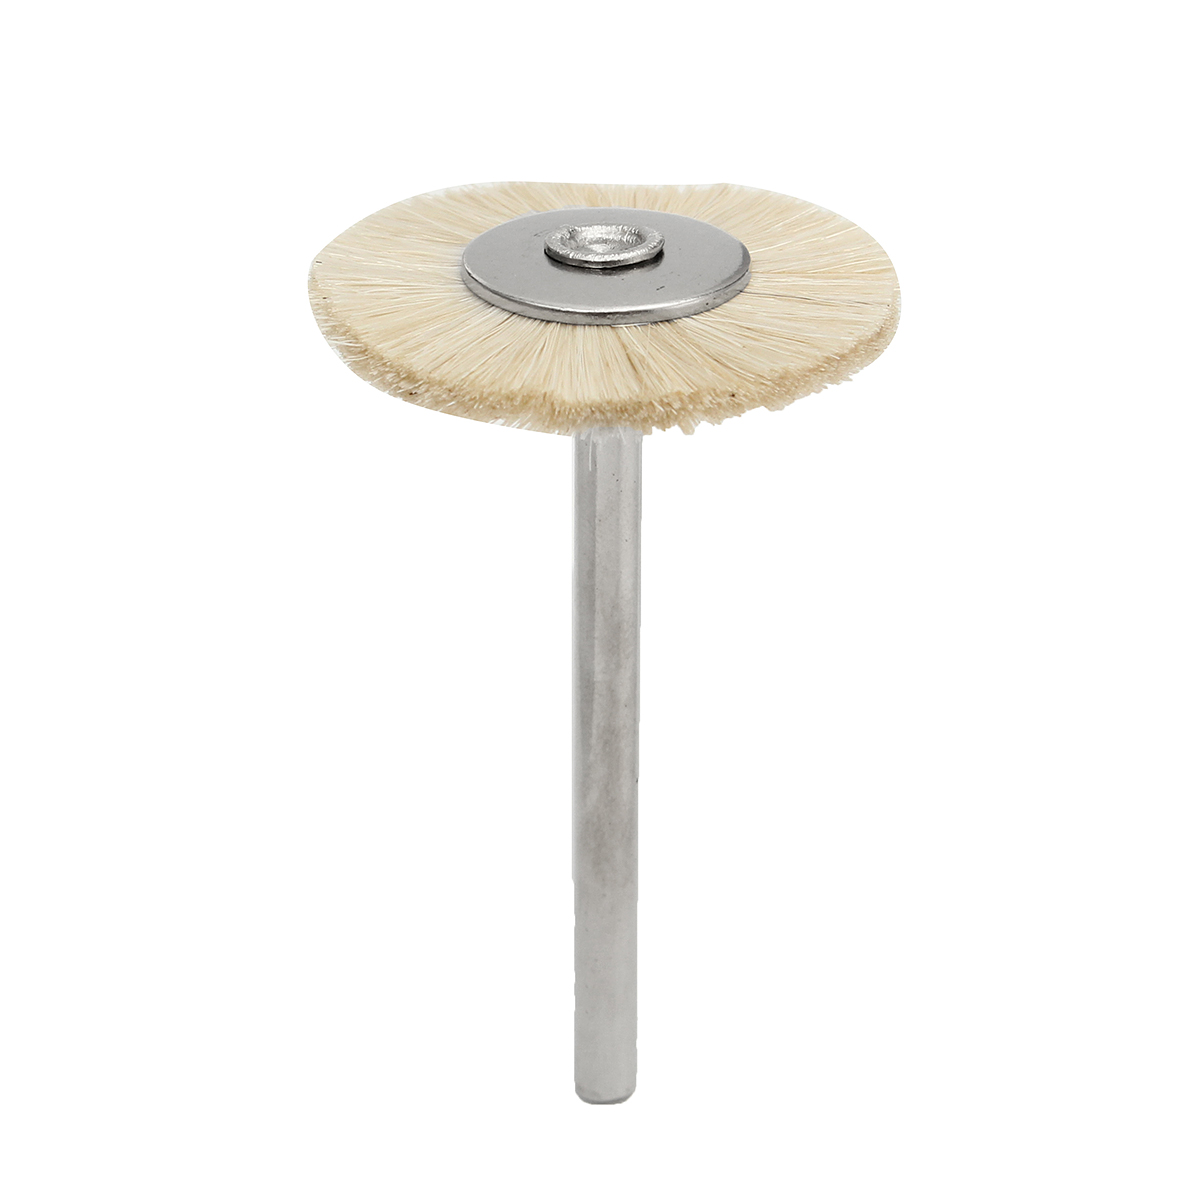 30 Pcs Gigi Polishing Brushes 3mm Roda Buffing Membersihkan Sikat Poles Putih Lembut Bulu Kambing Burs Untuk Laboratorium Rotary Alat 2018 Di Whitening